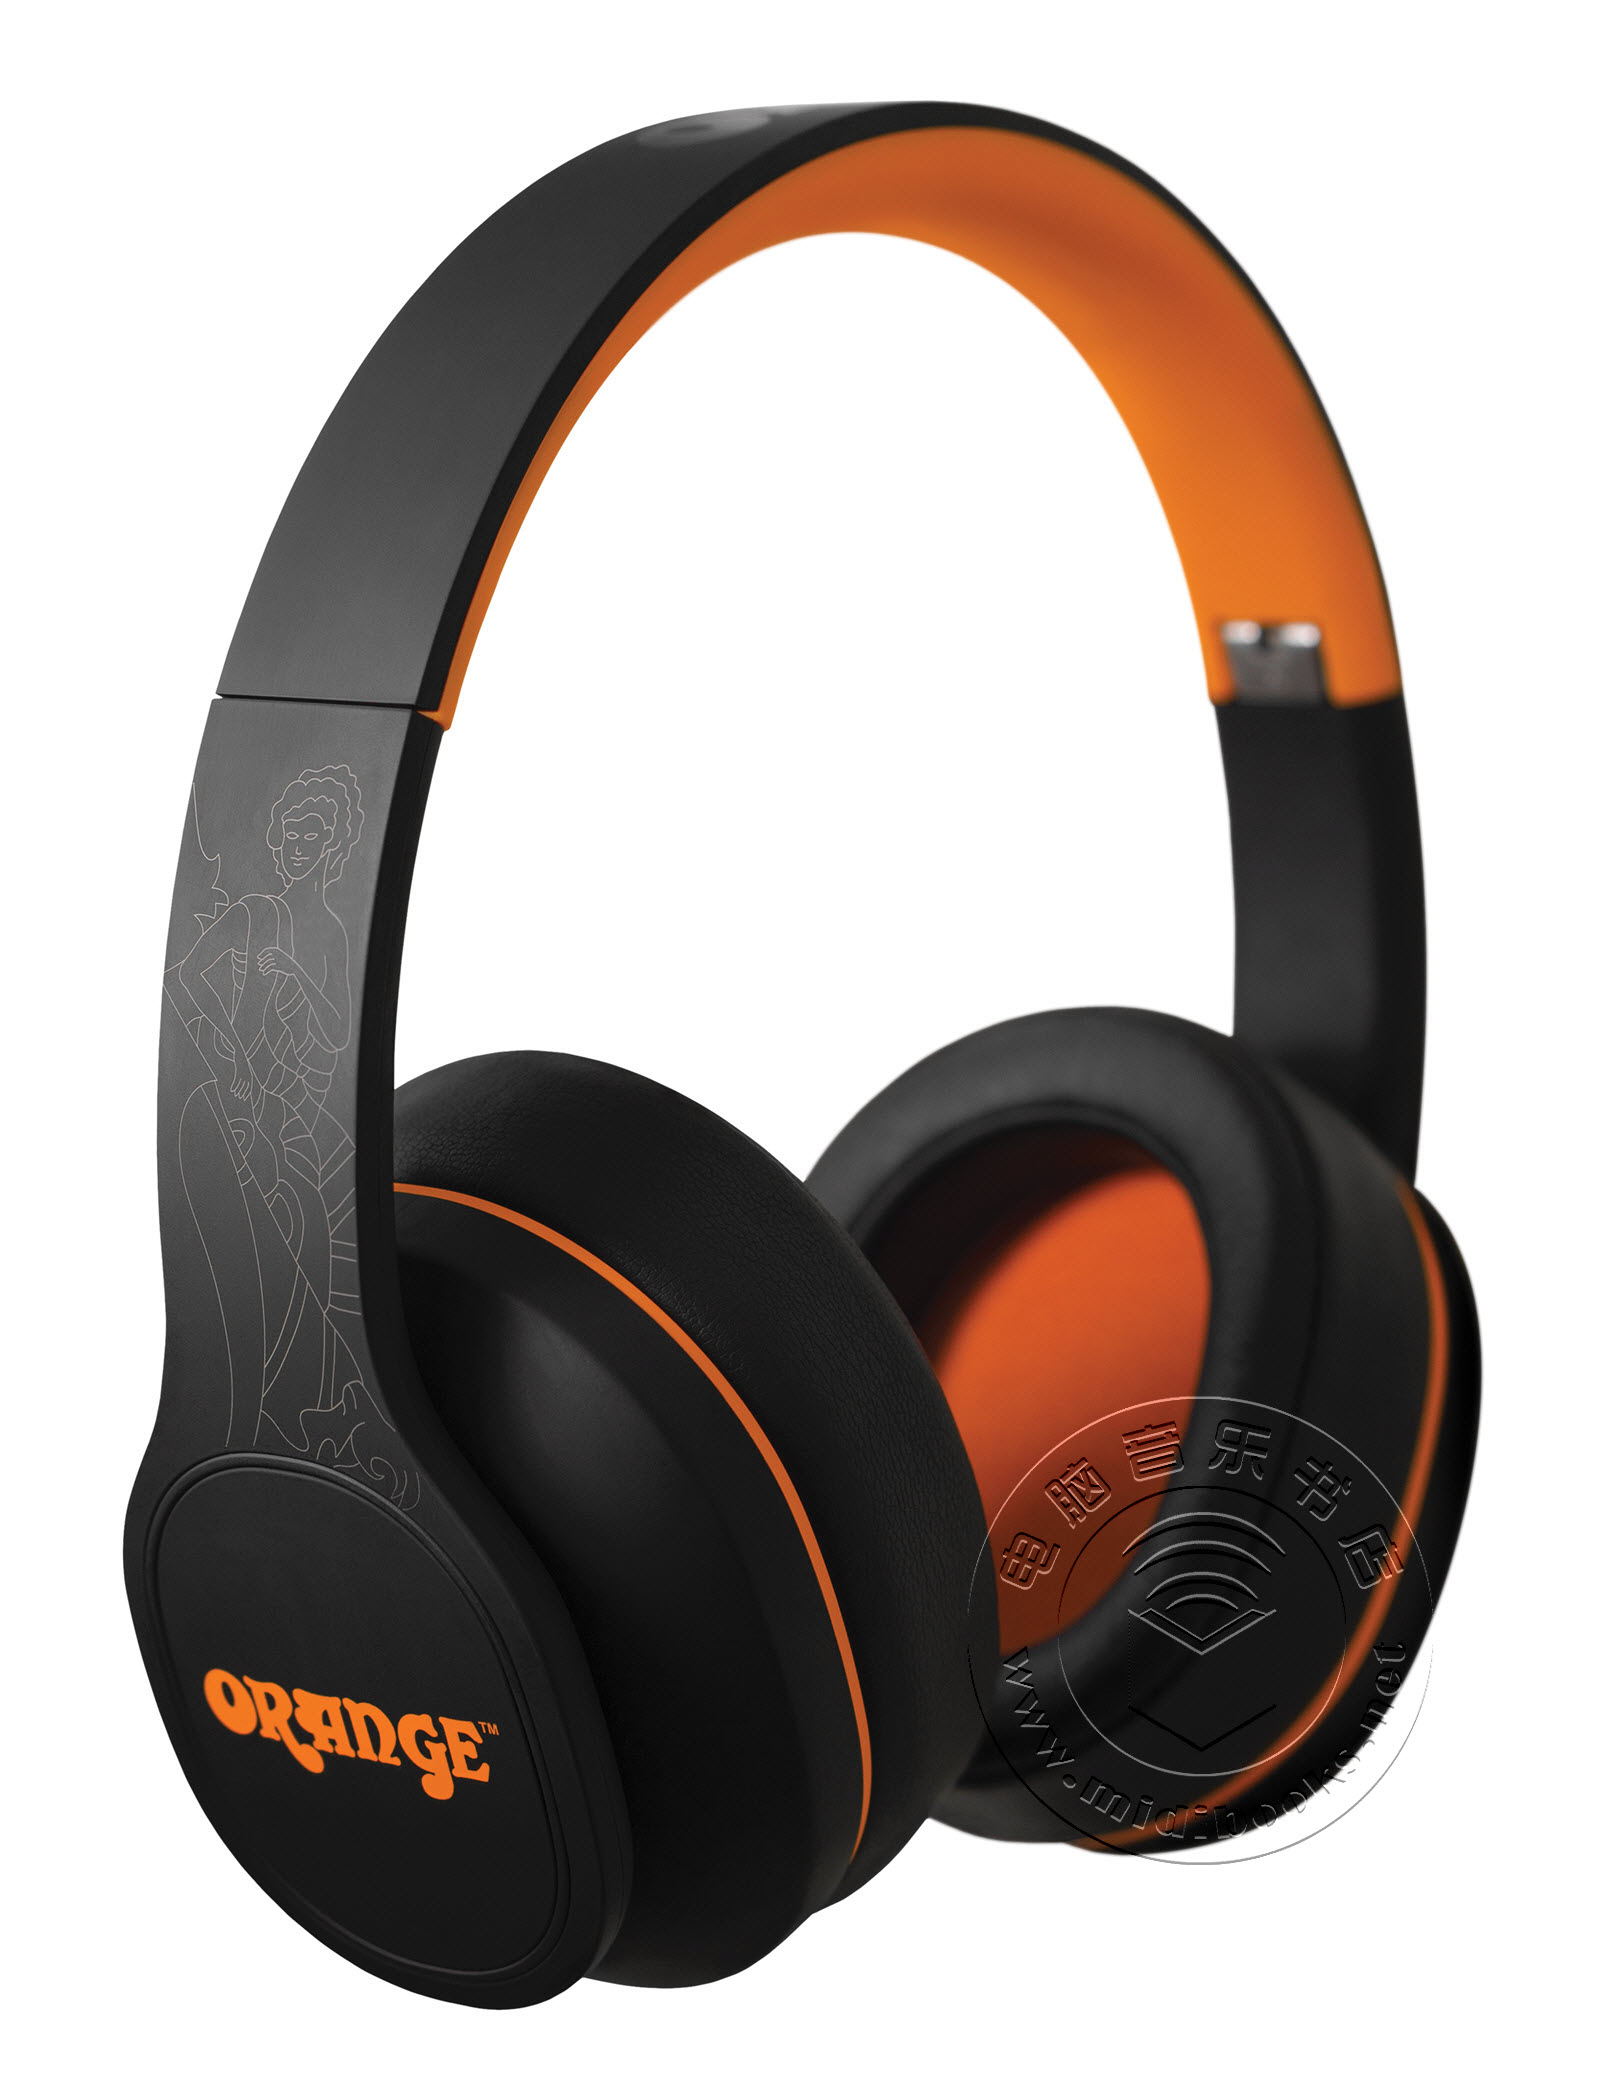 Orange Amplification(桔色放大器)宣布推出新的Crest版无线蓝牙耳机